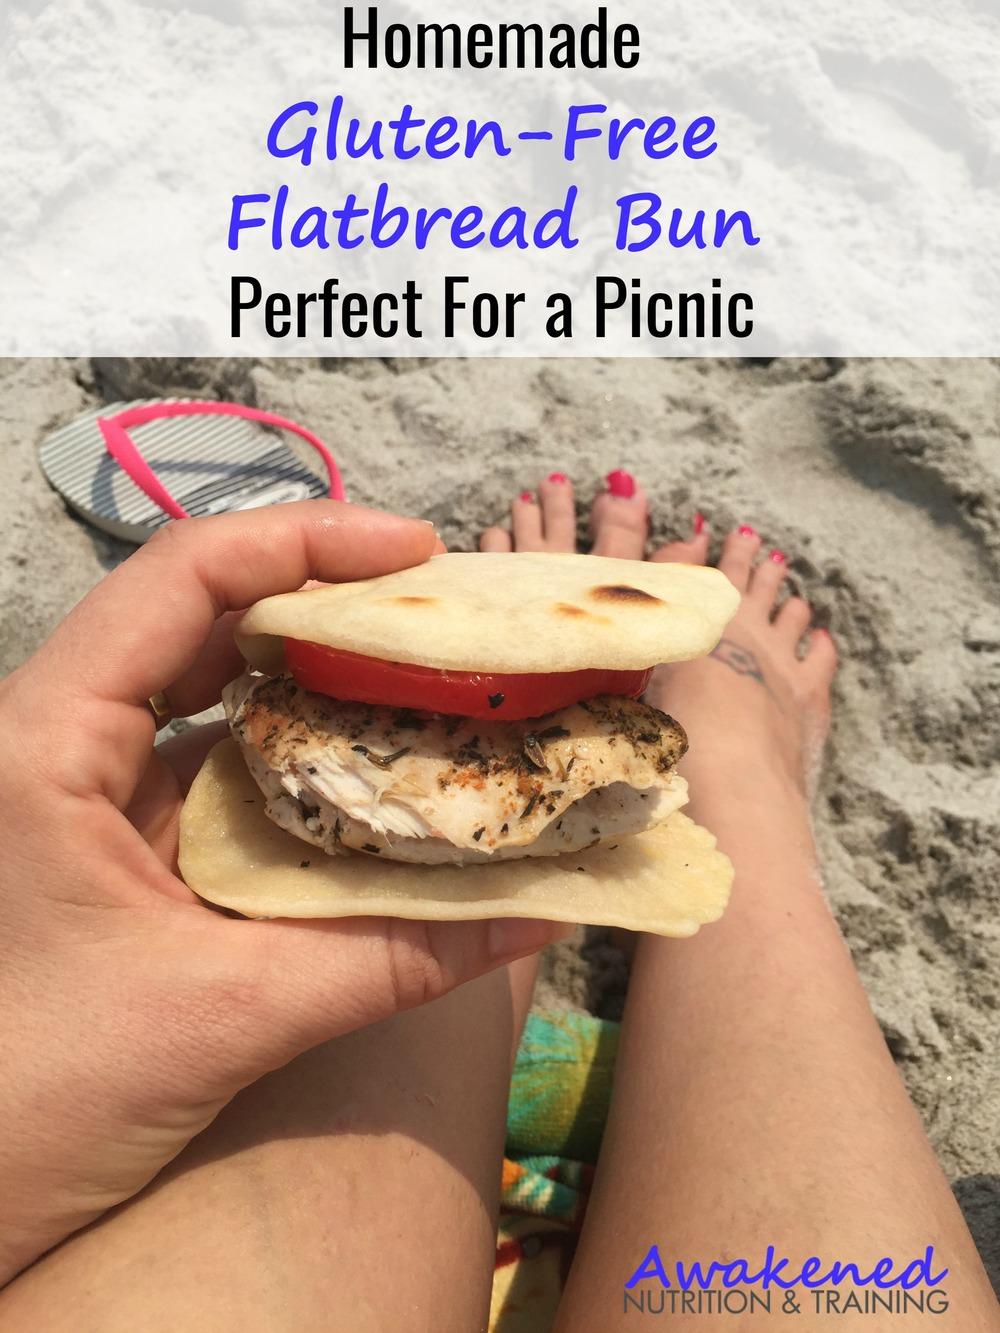 Homemade Gluten-Free Flatbread Bun (soy, dairy, gluten & nut-free)